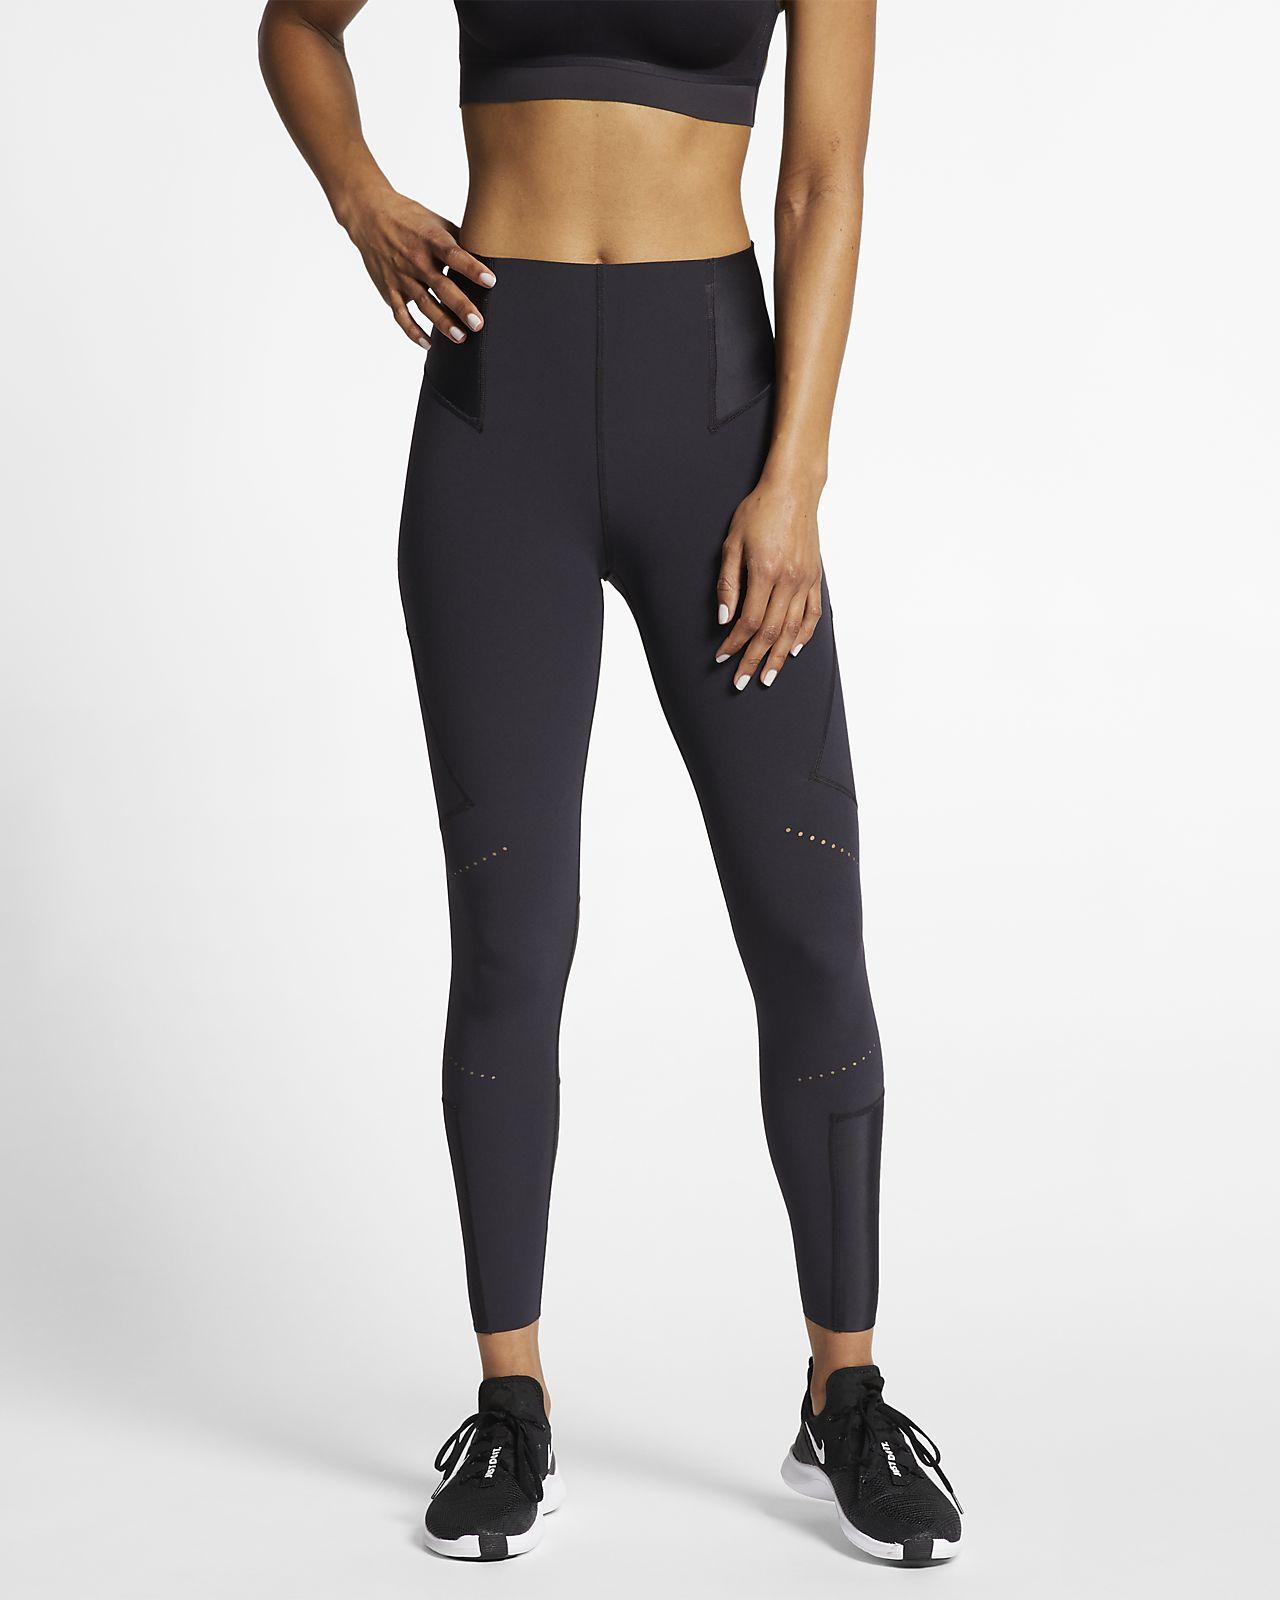 2490ce0933fae Nike Tech Pack Women's Training Tights. Nike.com